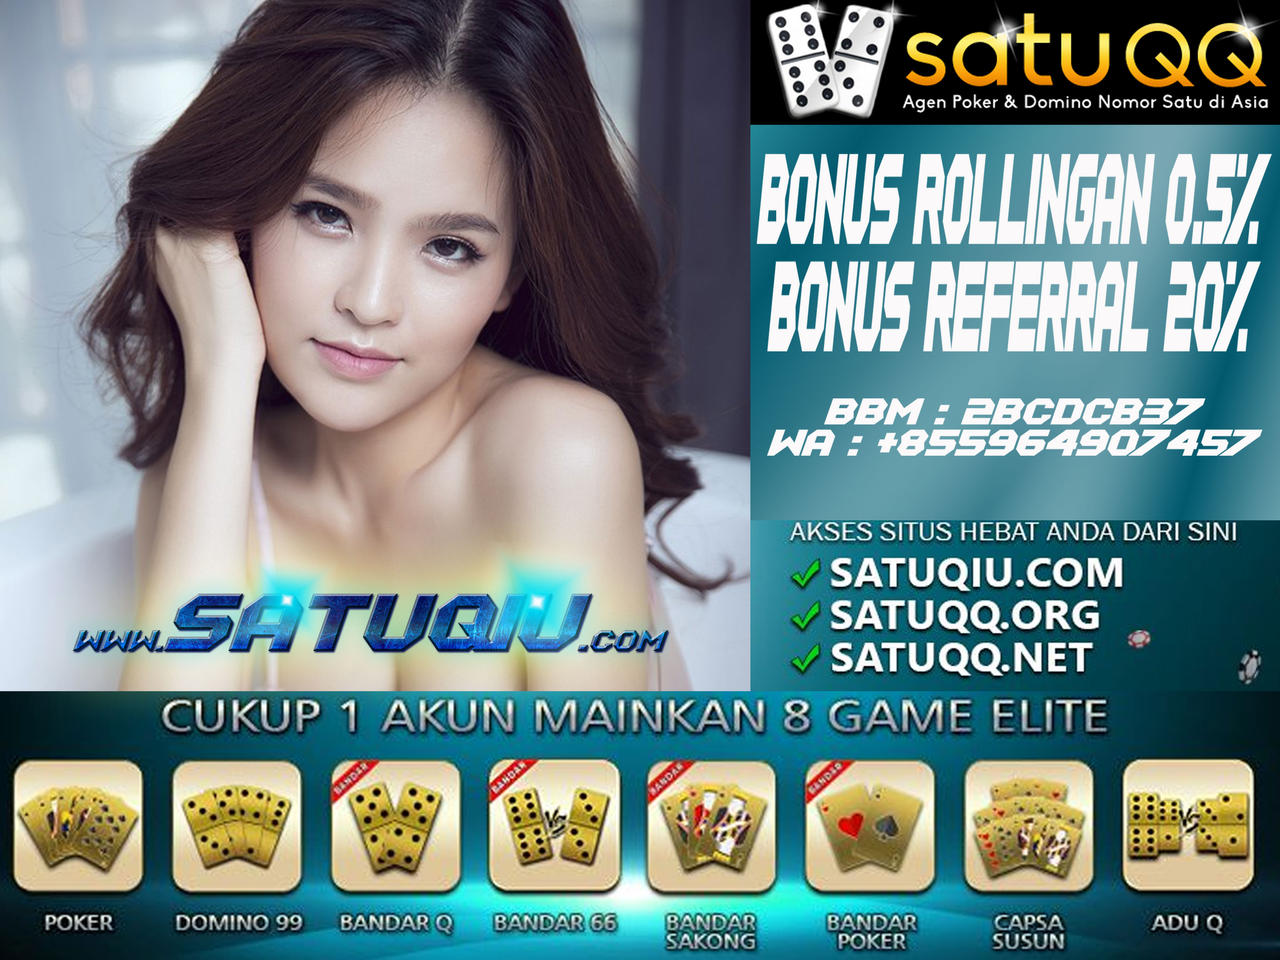 Poker Online Satuqq Agen Terpercaya By Bandarhunter On Deviantart